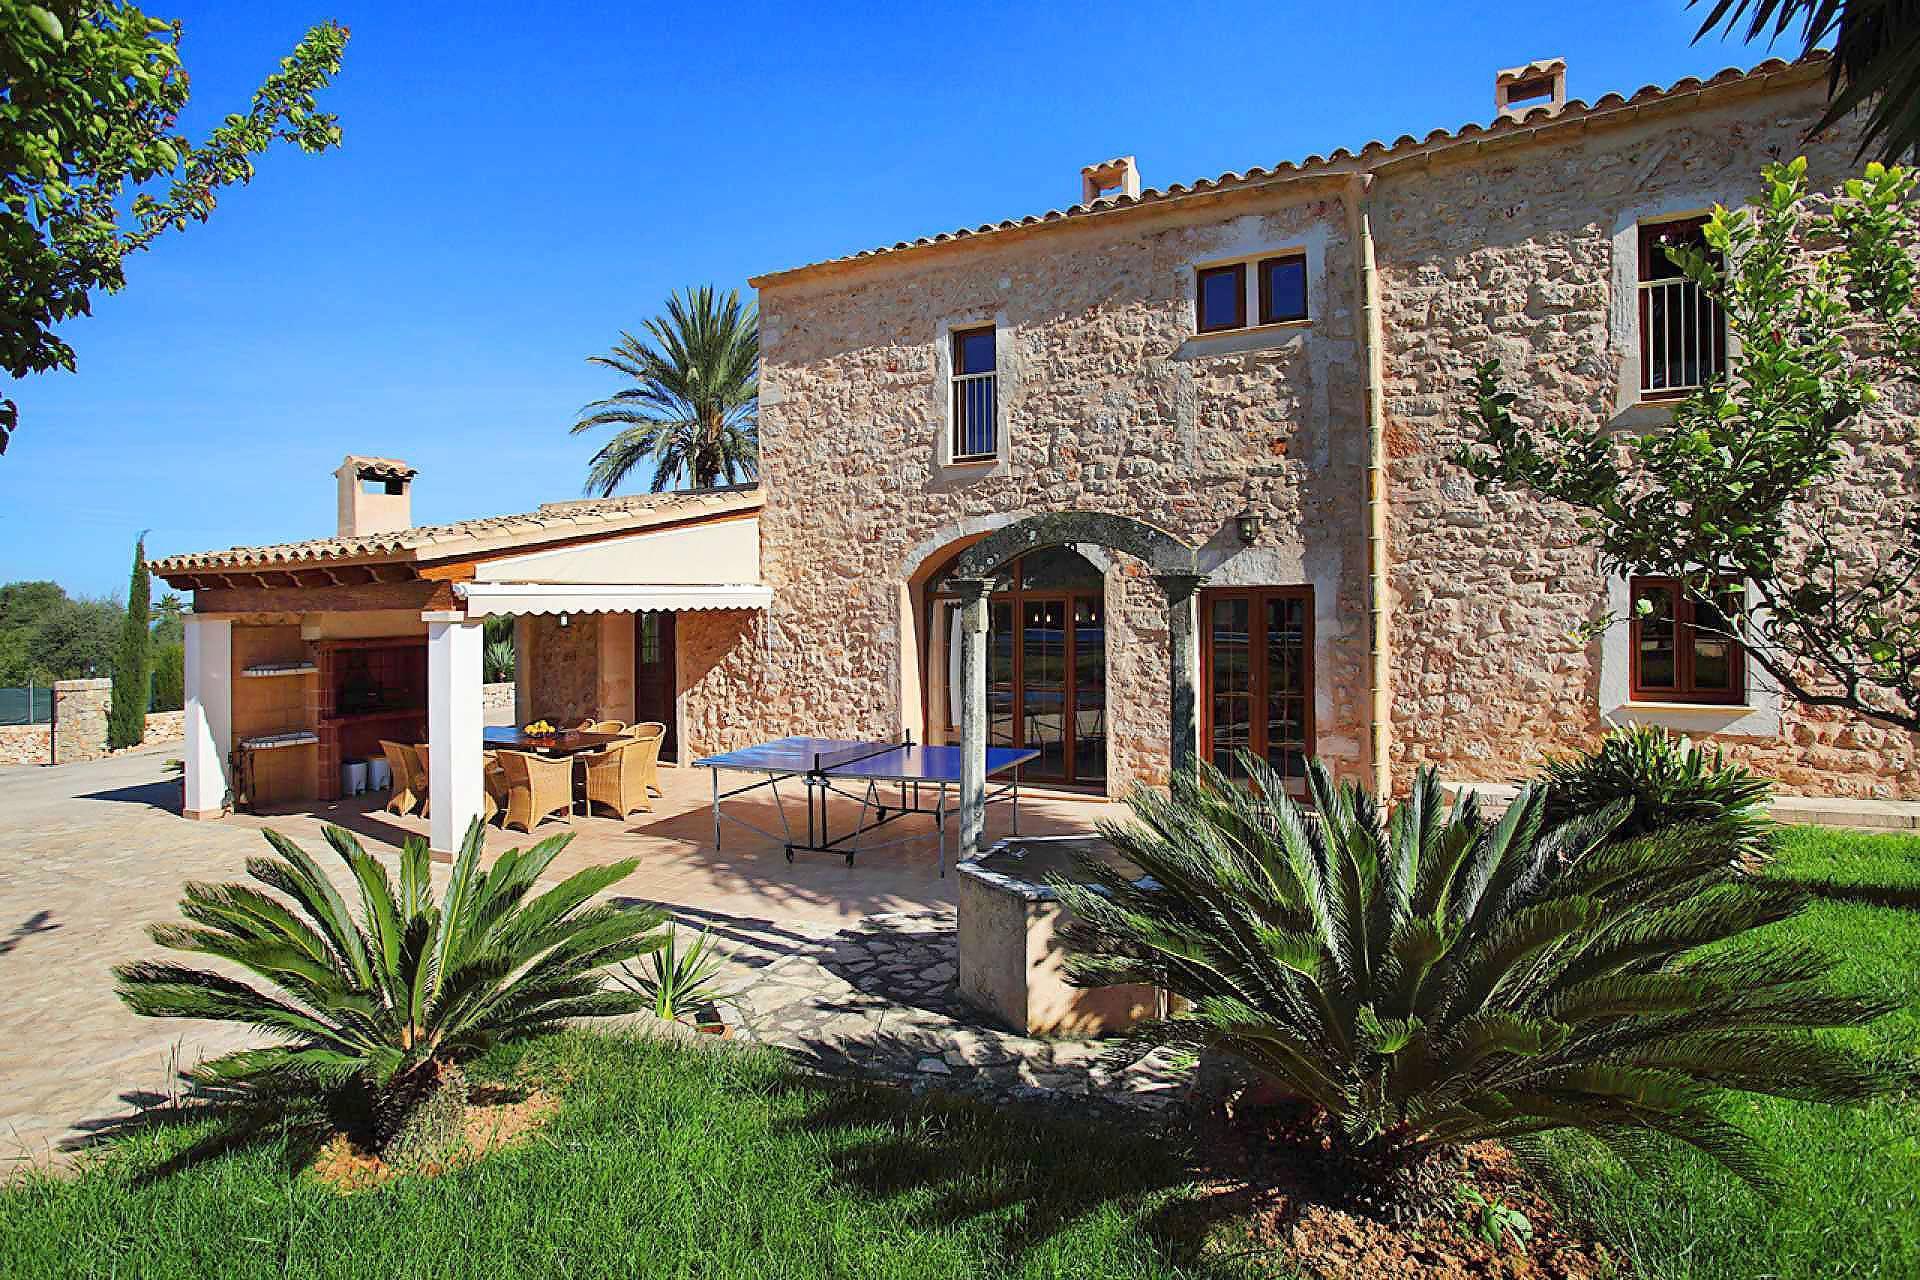 01-33 Spacious holiday home Mallorca East Bild 10